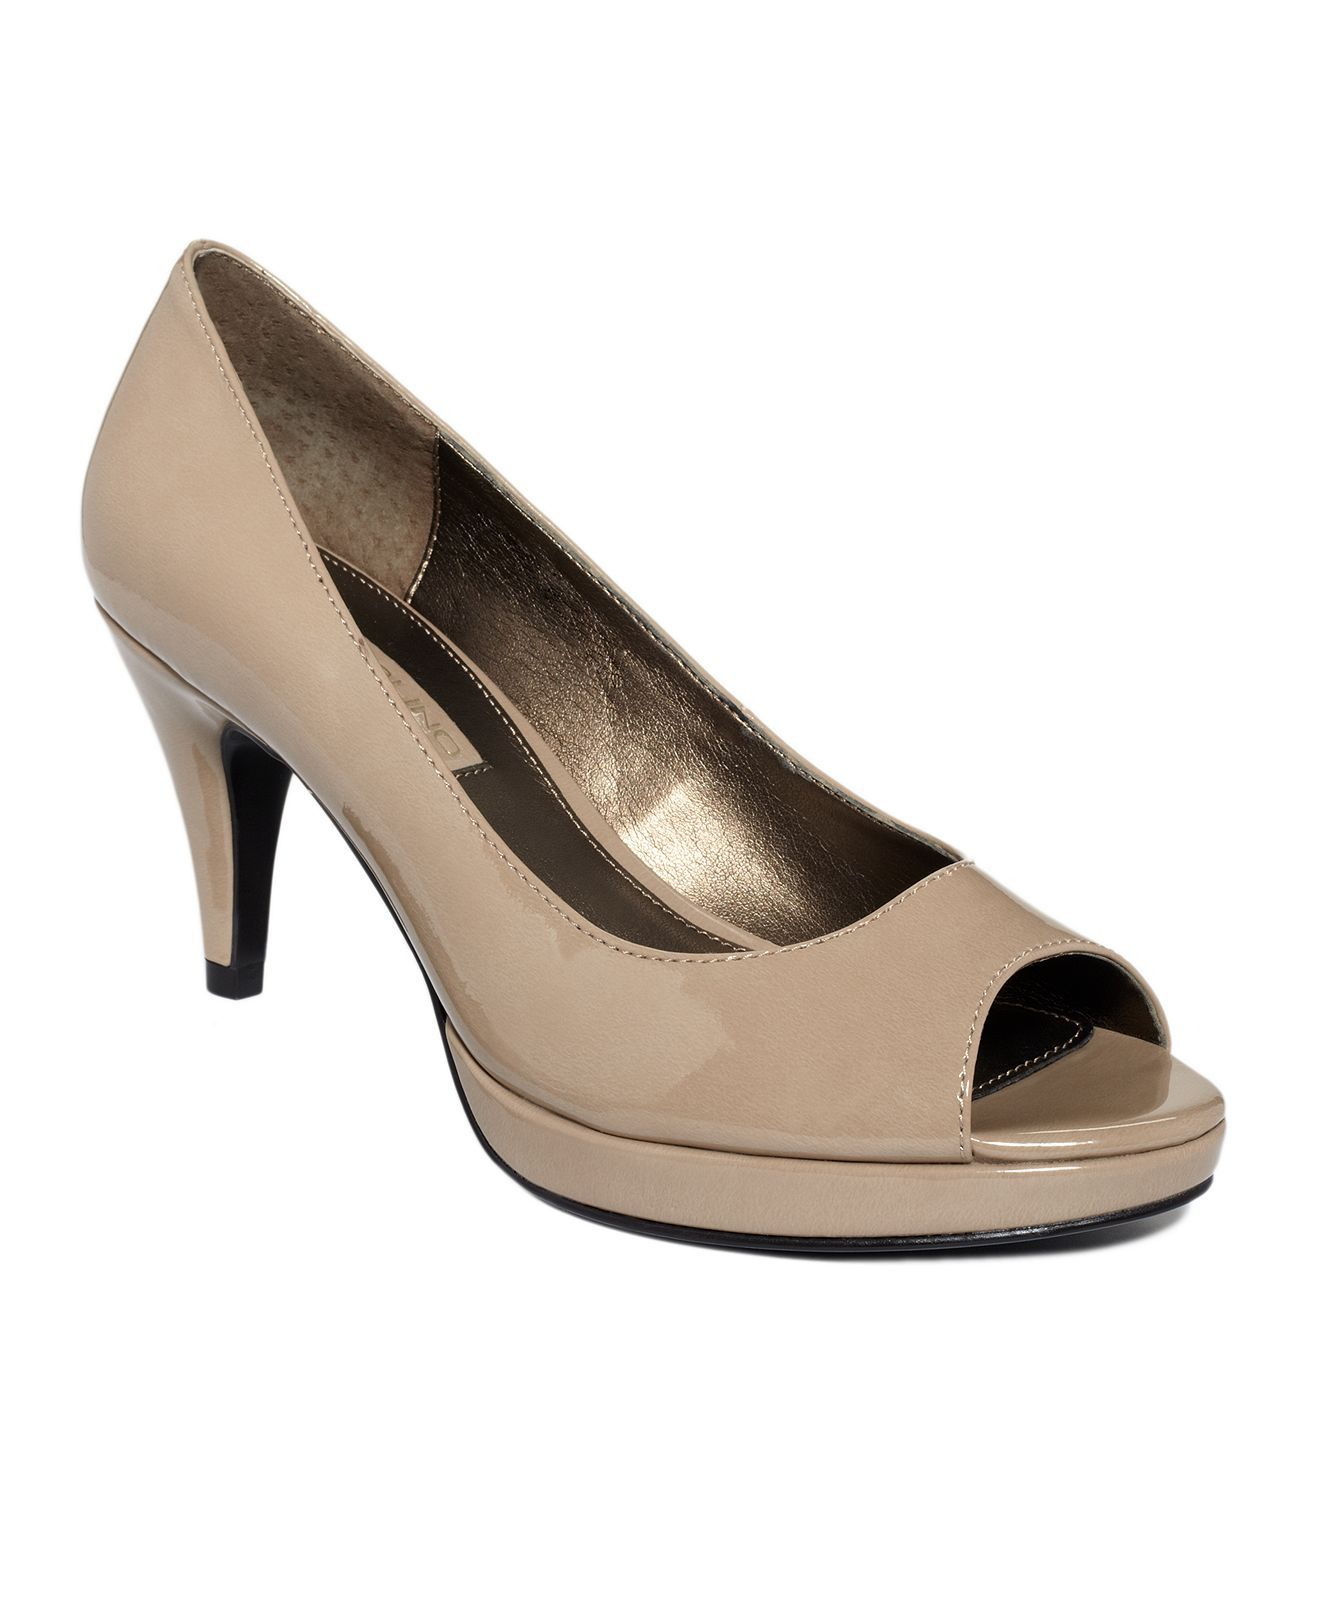 1383deb230da Bandolino Shoes